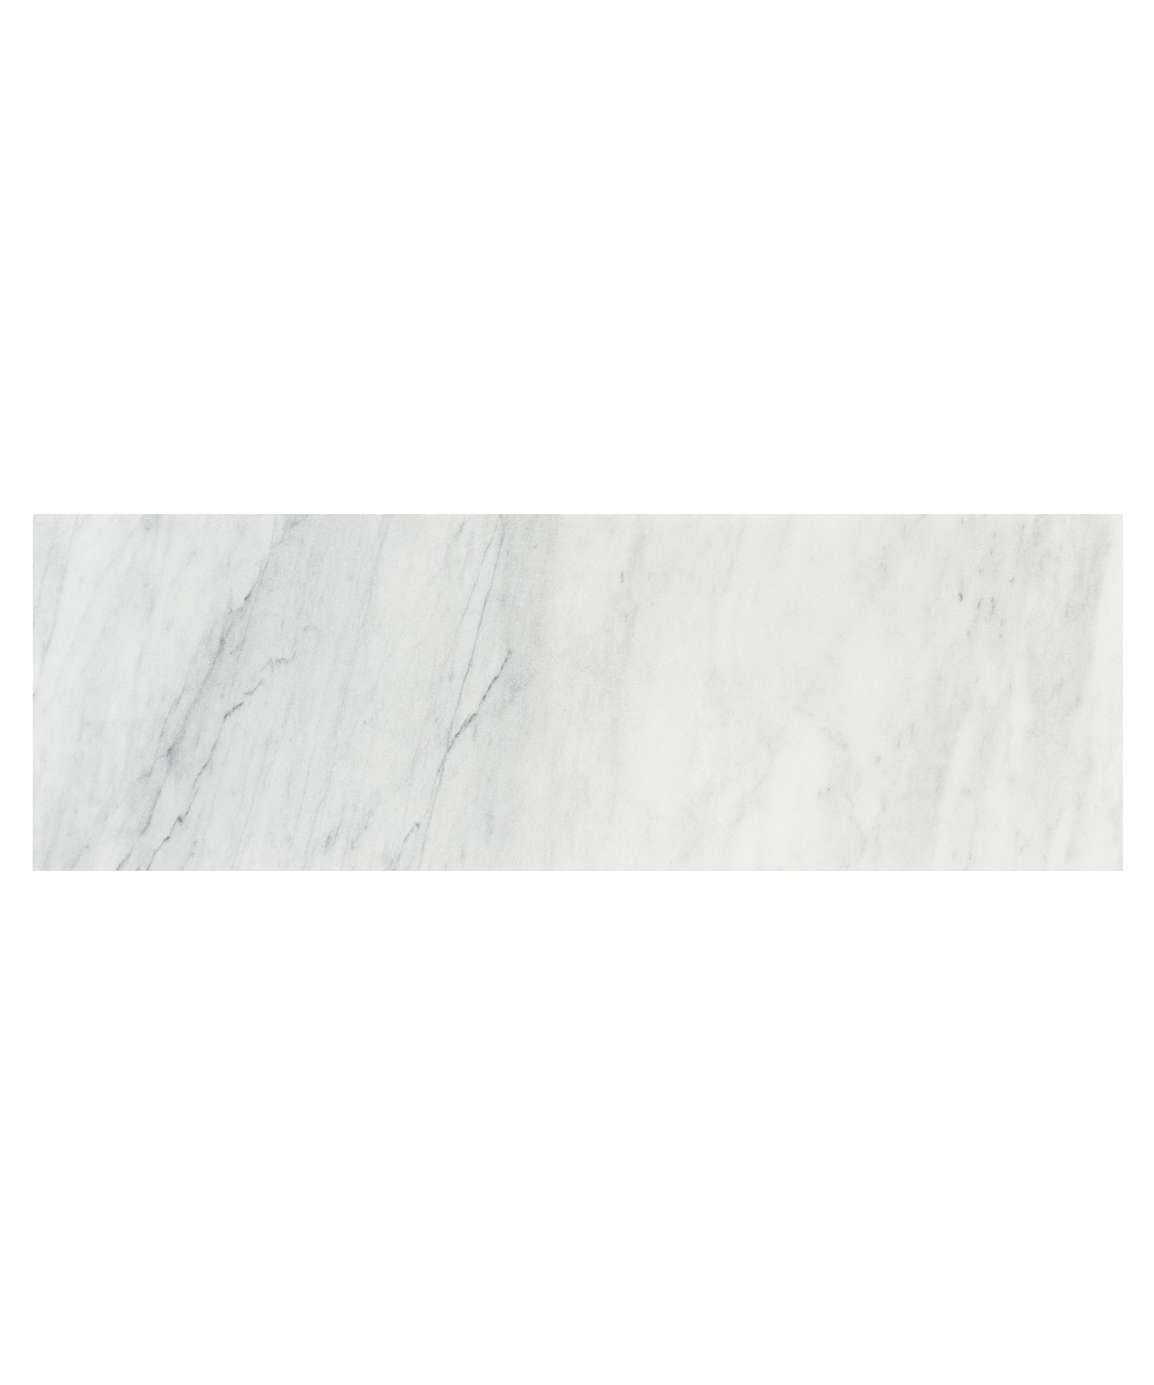 luxury tiles amasya white honed marble 45x15cm wall and floor tile